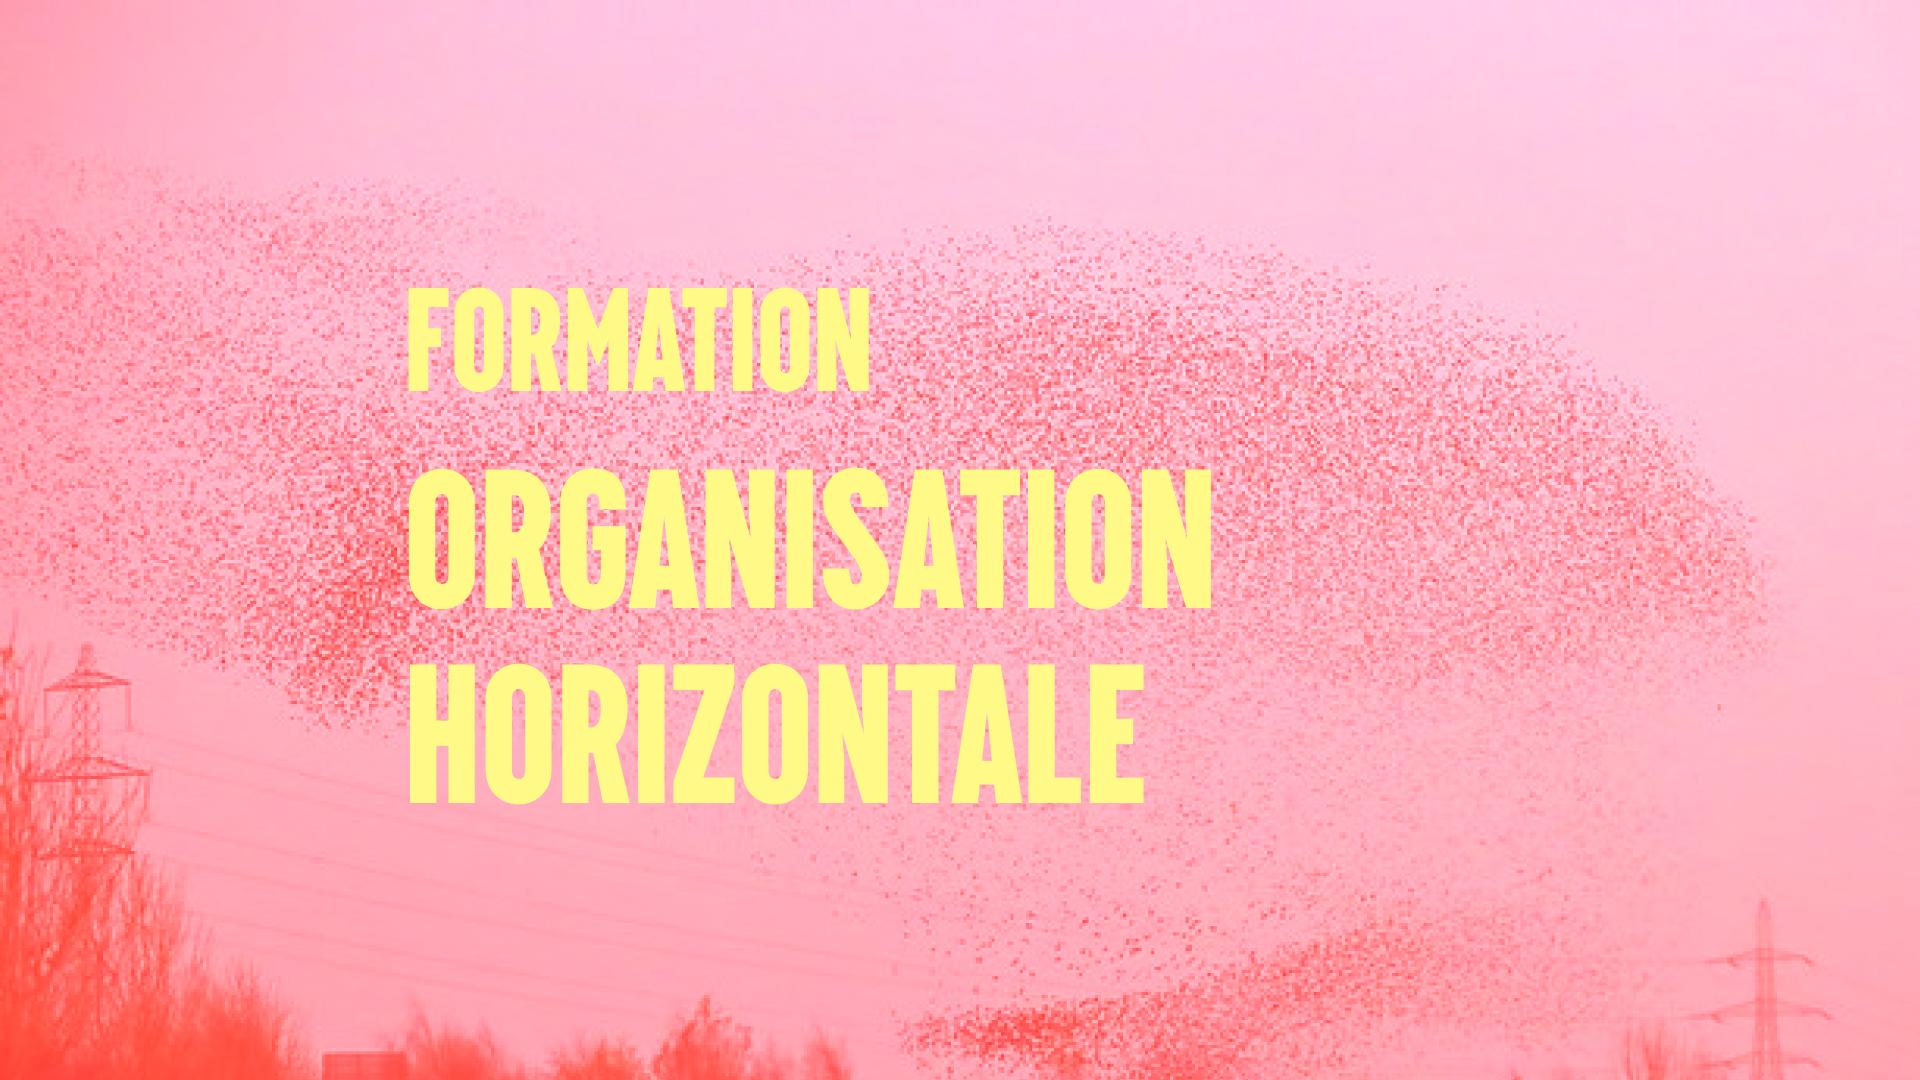 Formation Organisation Horizontale